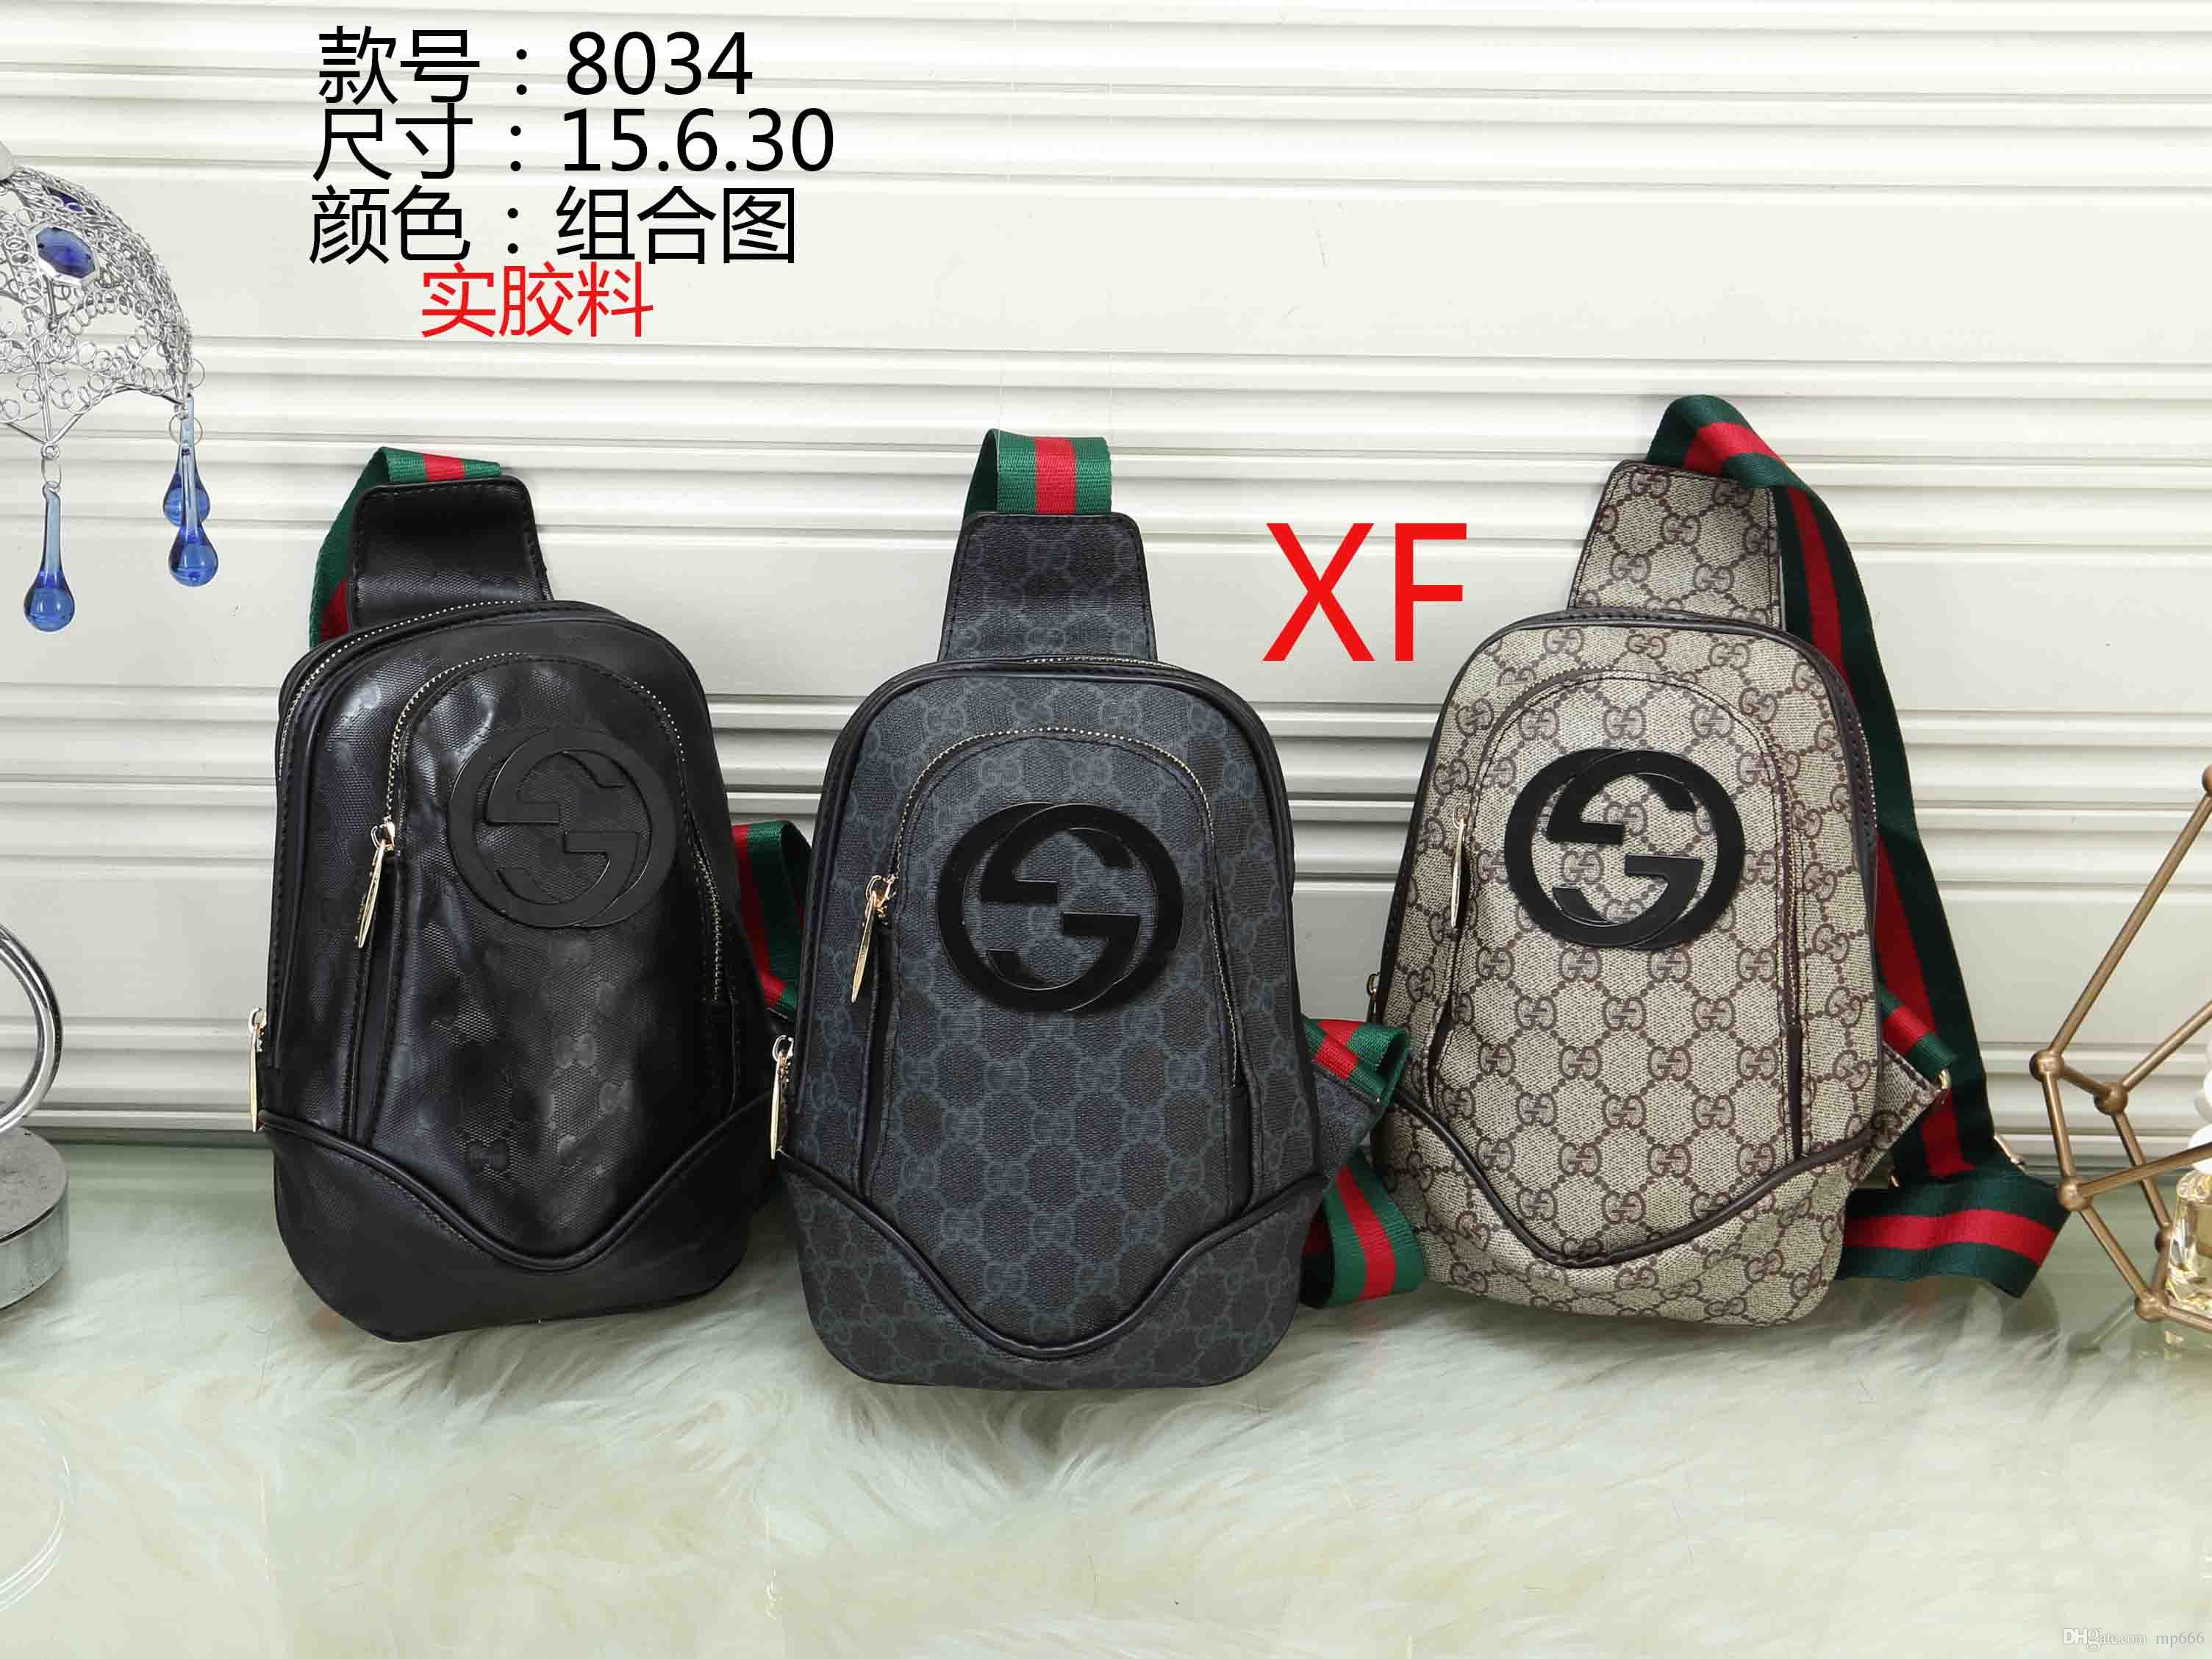 e753bfb37a High Quality Luxury Handbag Wallet Brand Handbags Handbags Messenger ...